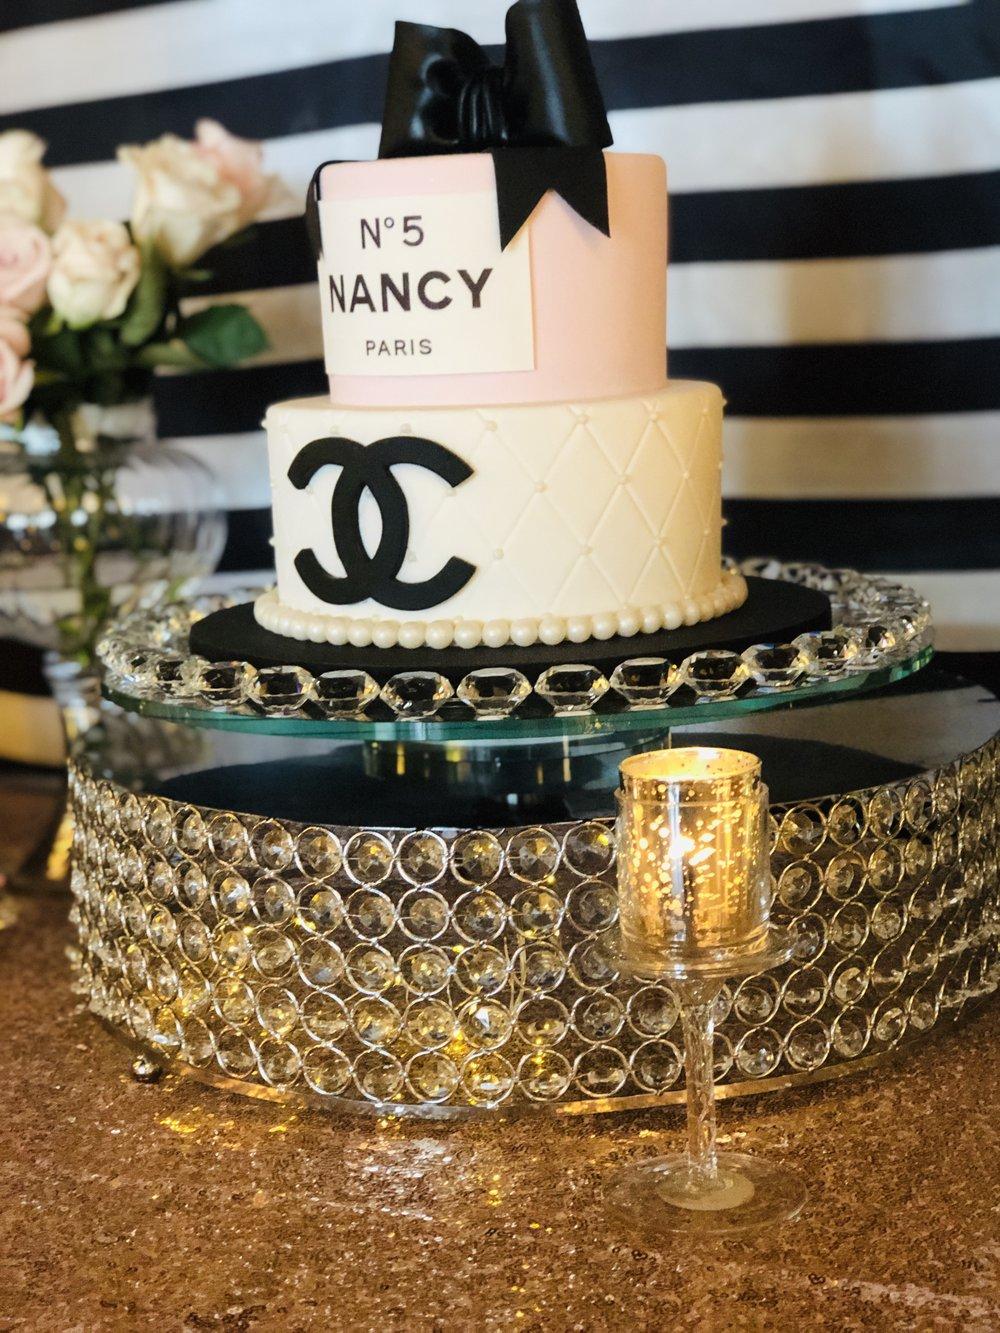 nancy's-bridal-shower-cake-with-chanel-no-5-design.jpeg